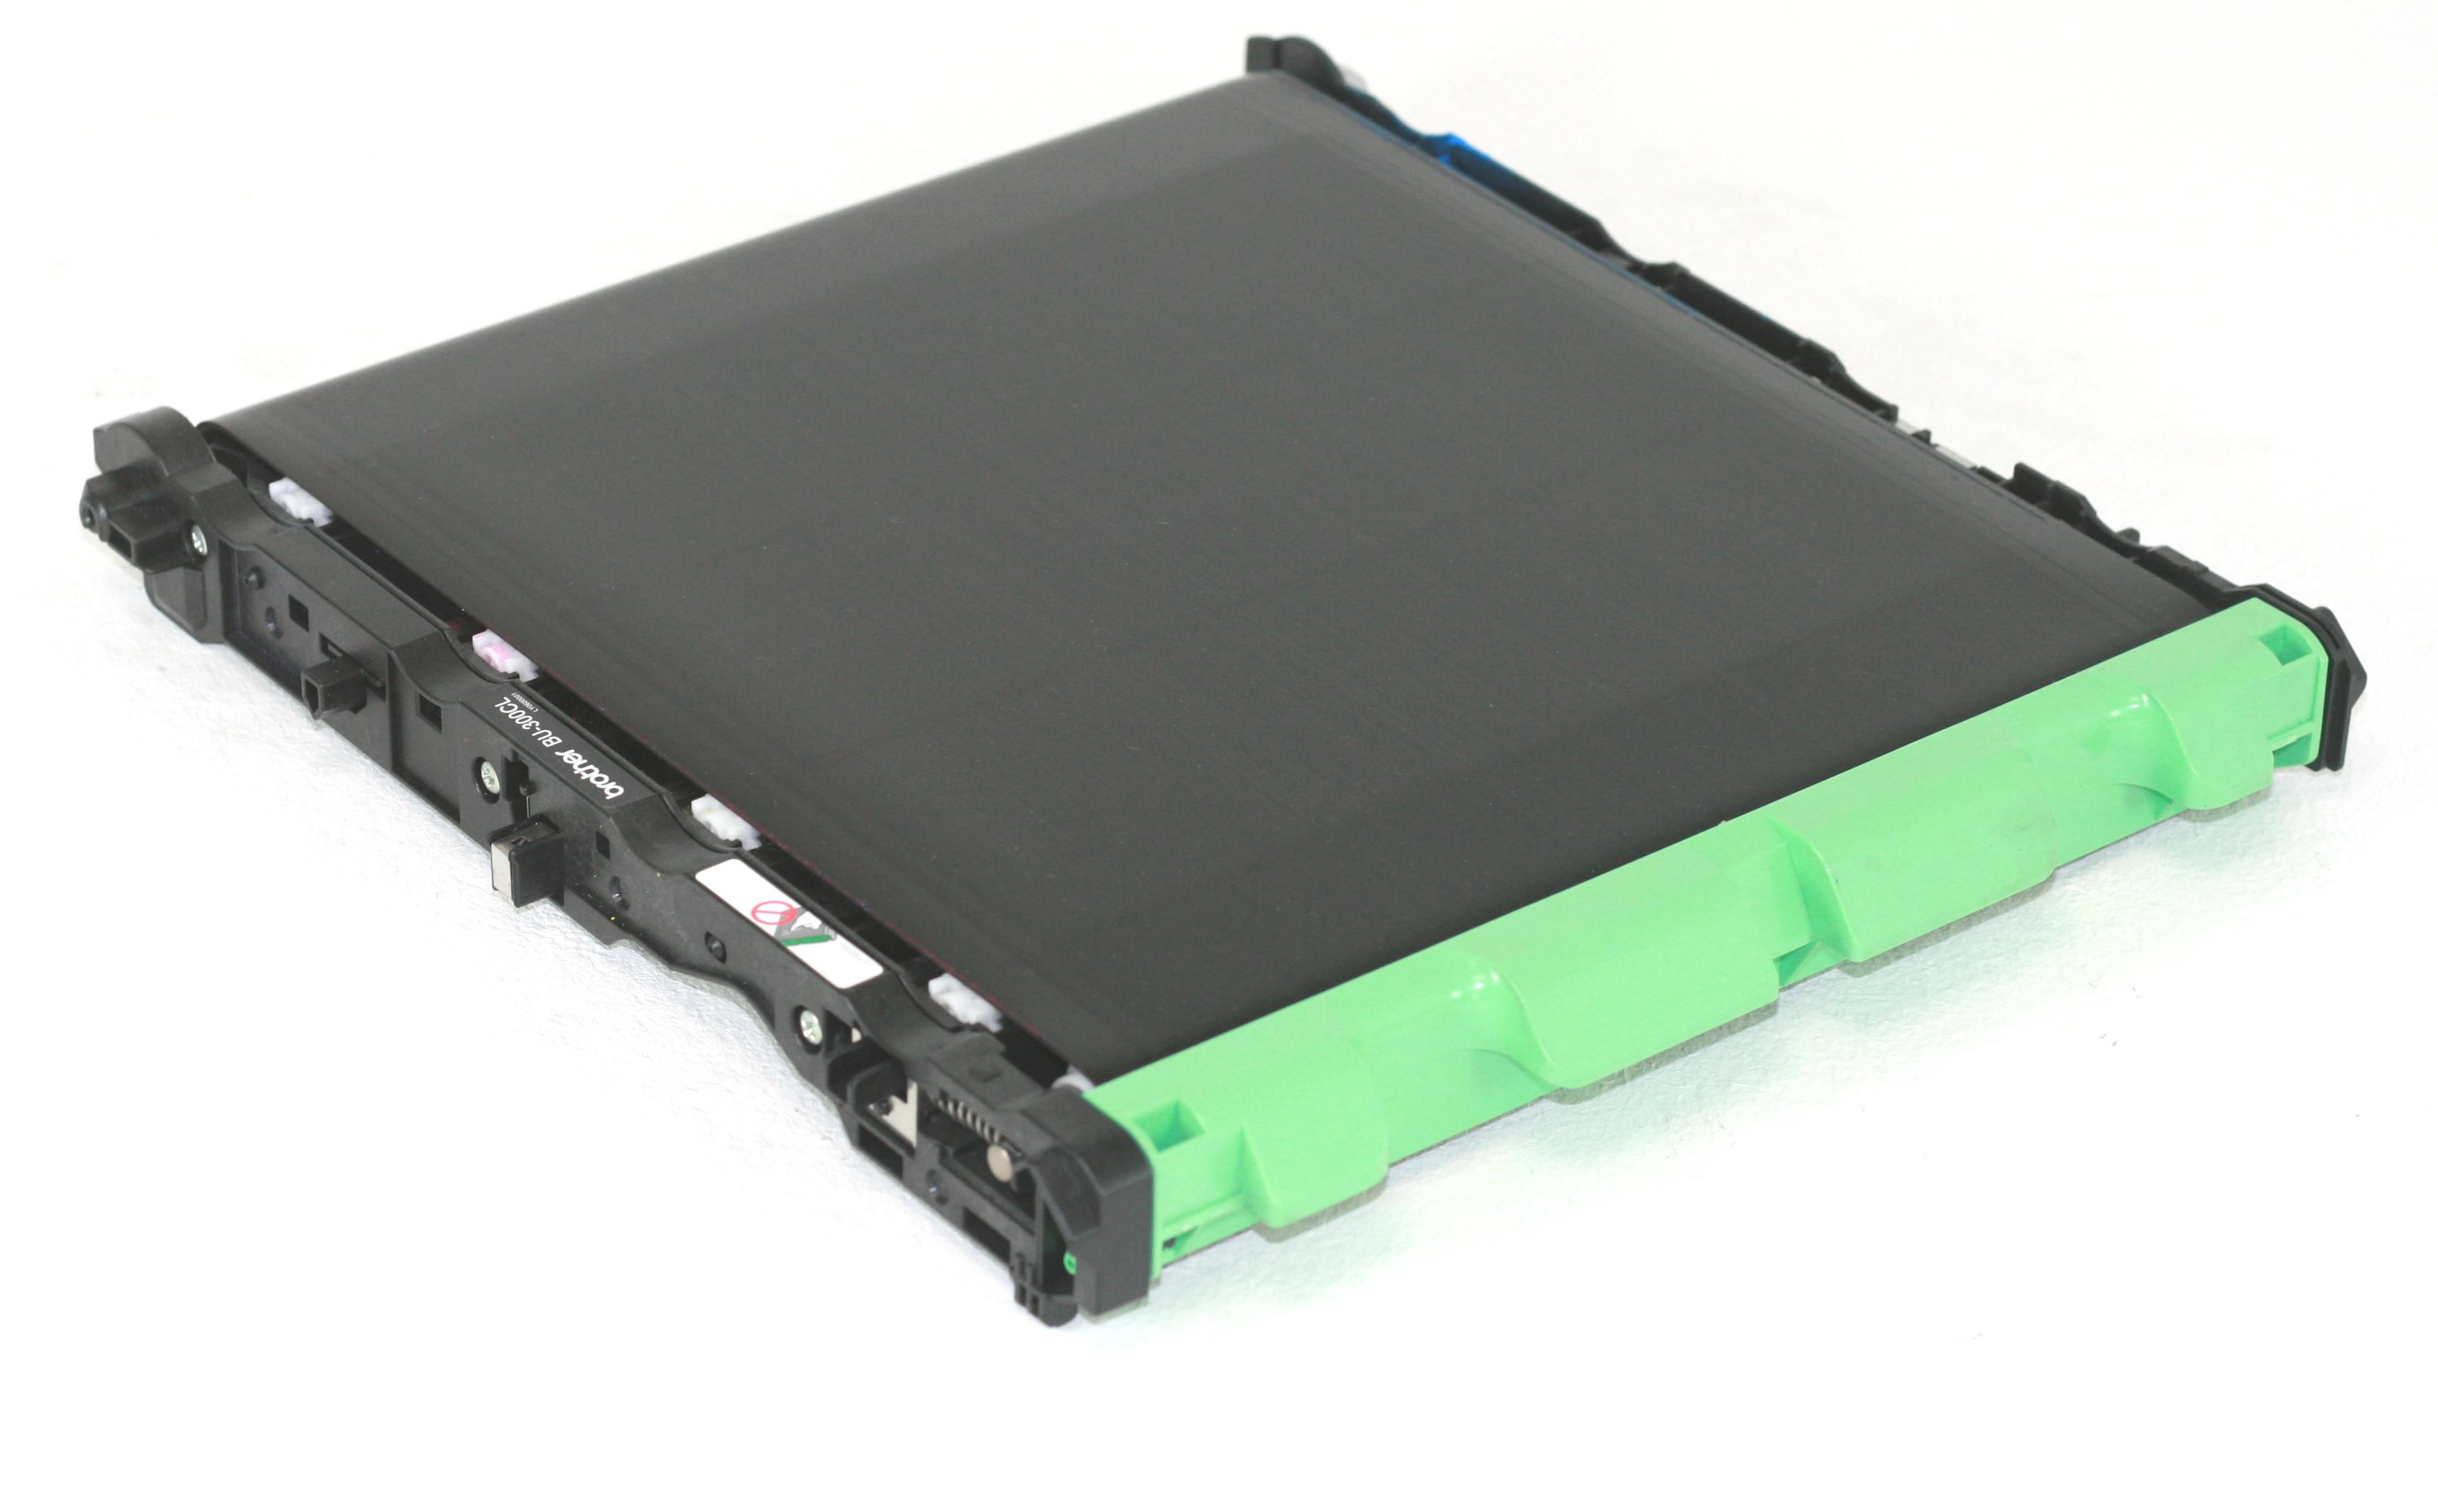 Brother BU-300CL Transferband Transfer Belt für Drucker HL 4140CN  4570CDW gebraucht